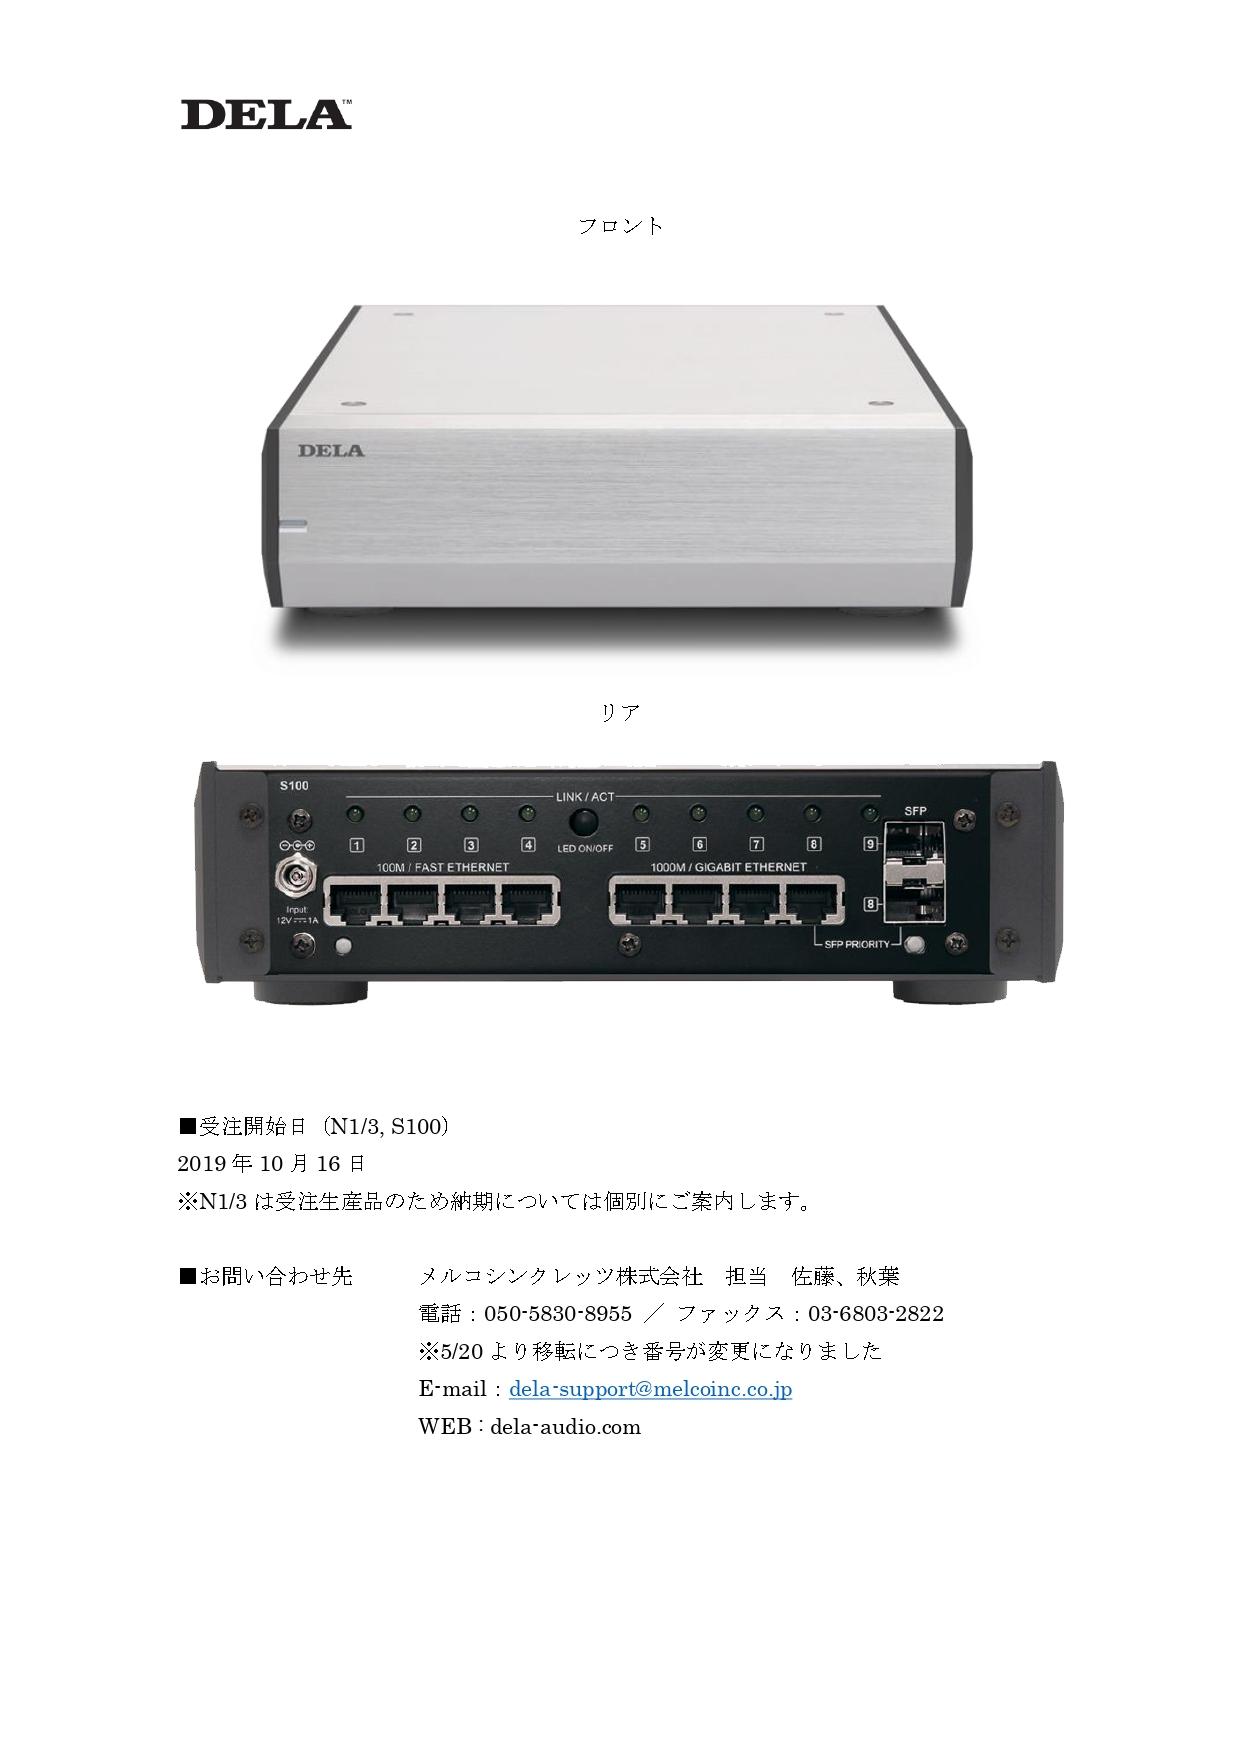 DELA 新製品 N1 MK3, S100_page-0005